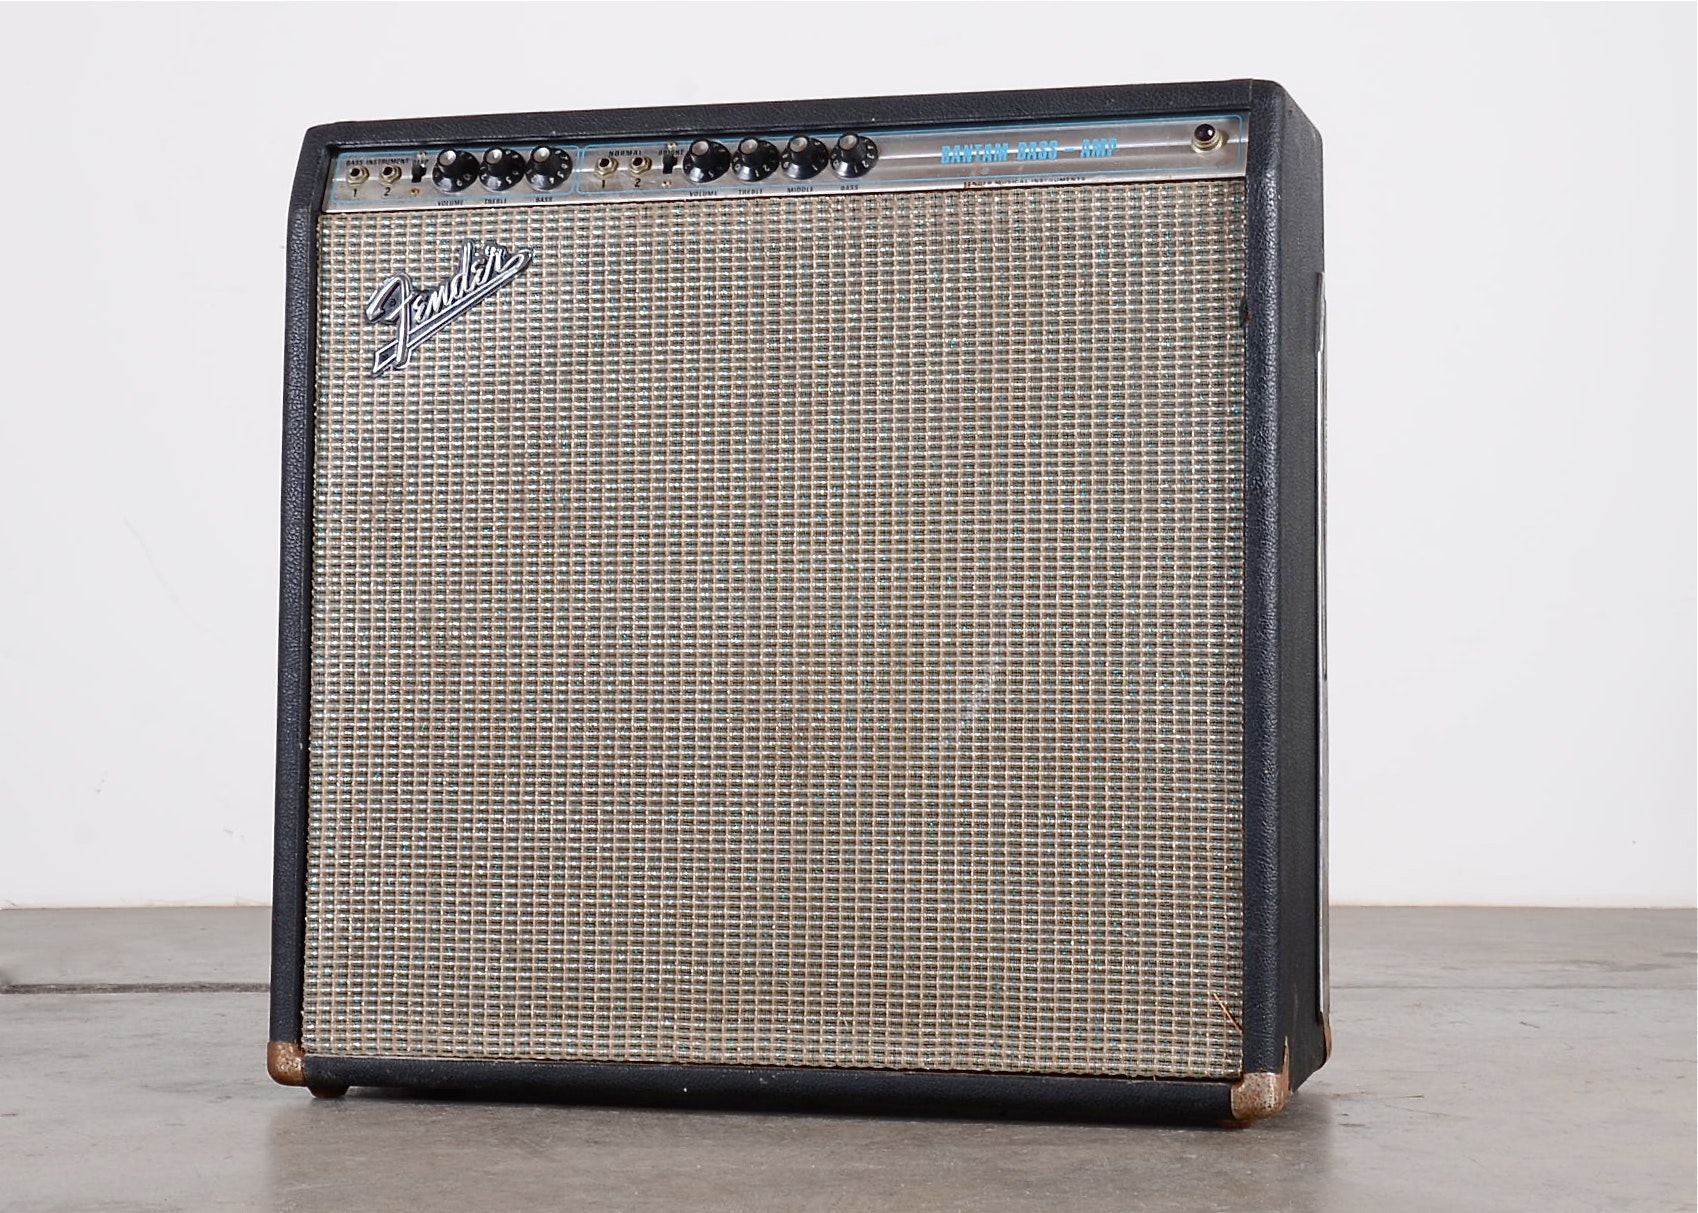 Fender Bantam Bass Amp Schematic Smart Wiring Diagrams Diagram 1969 Ebth Rh Com Chassis Amps Piggyback